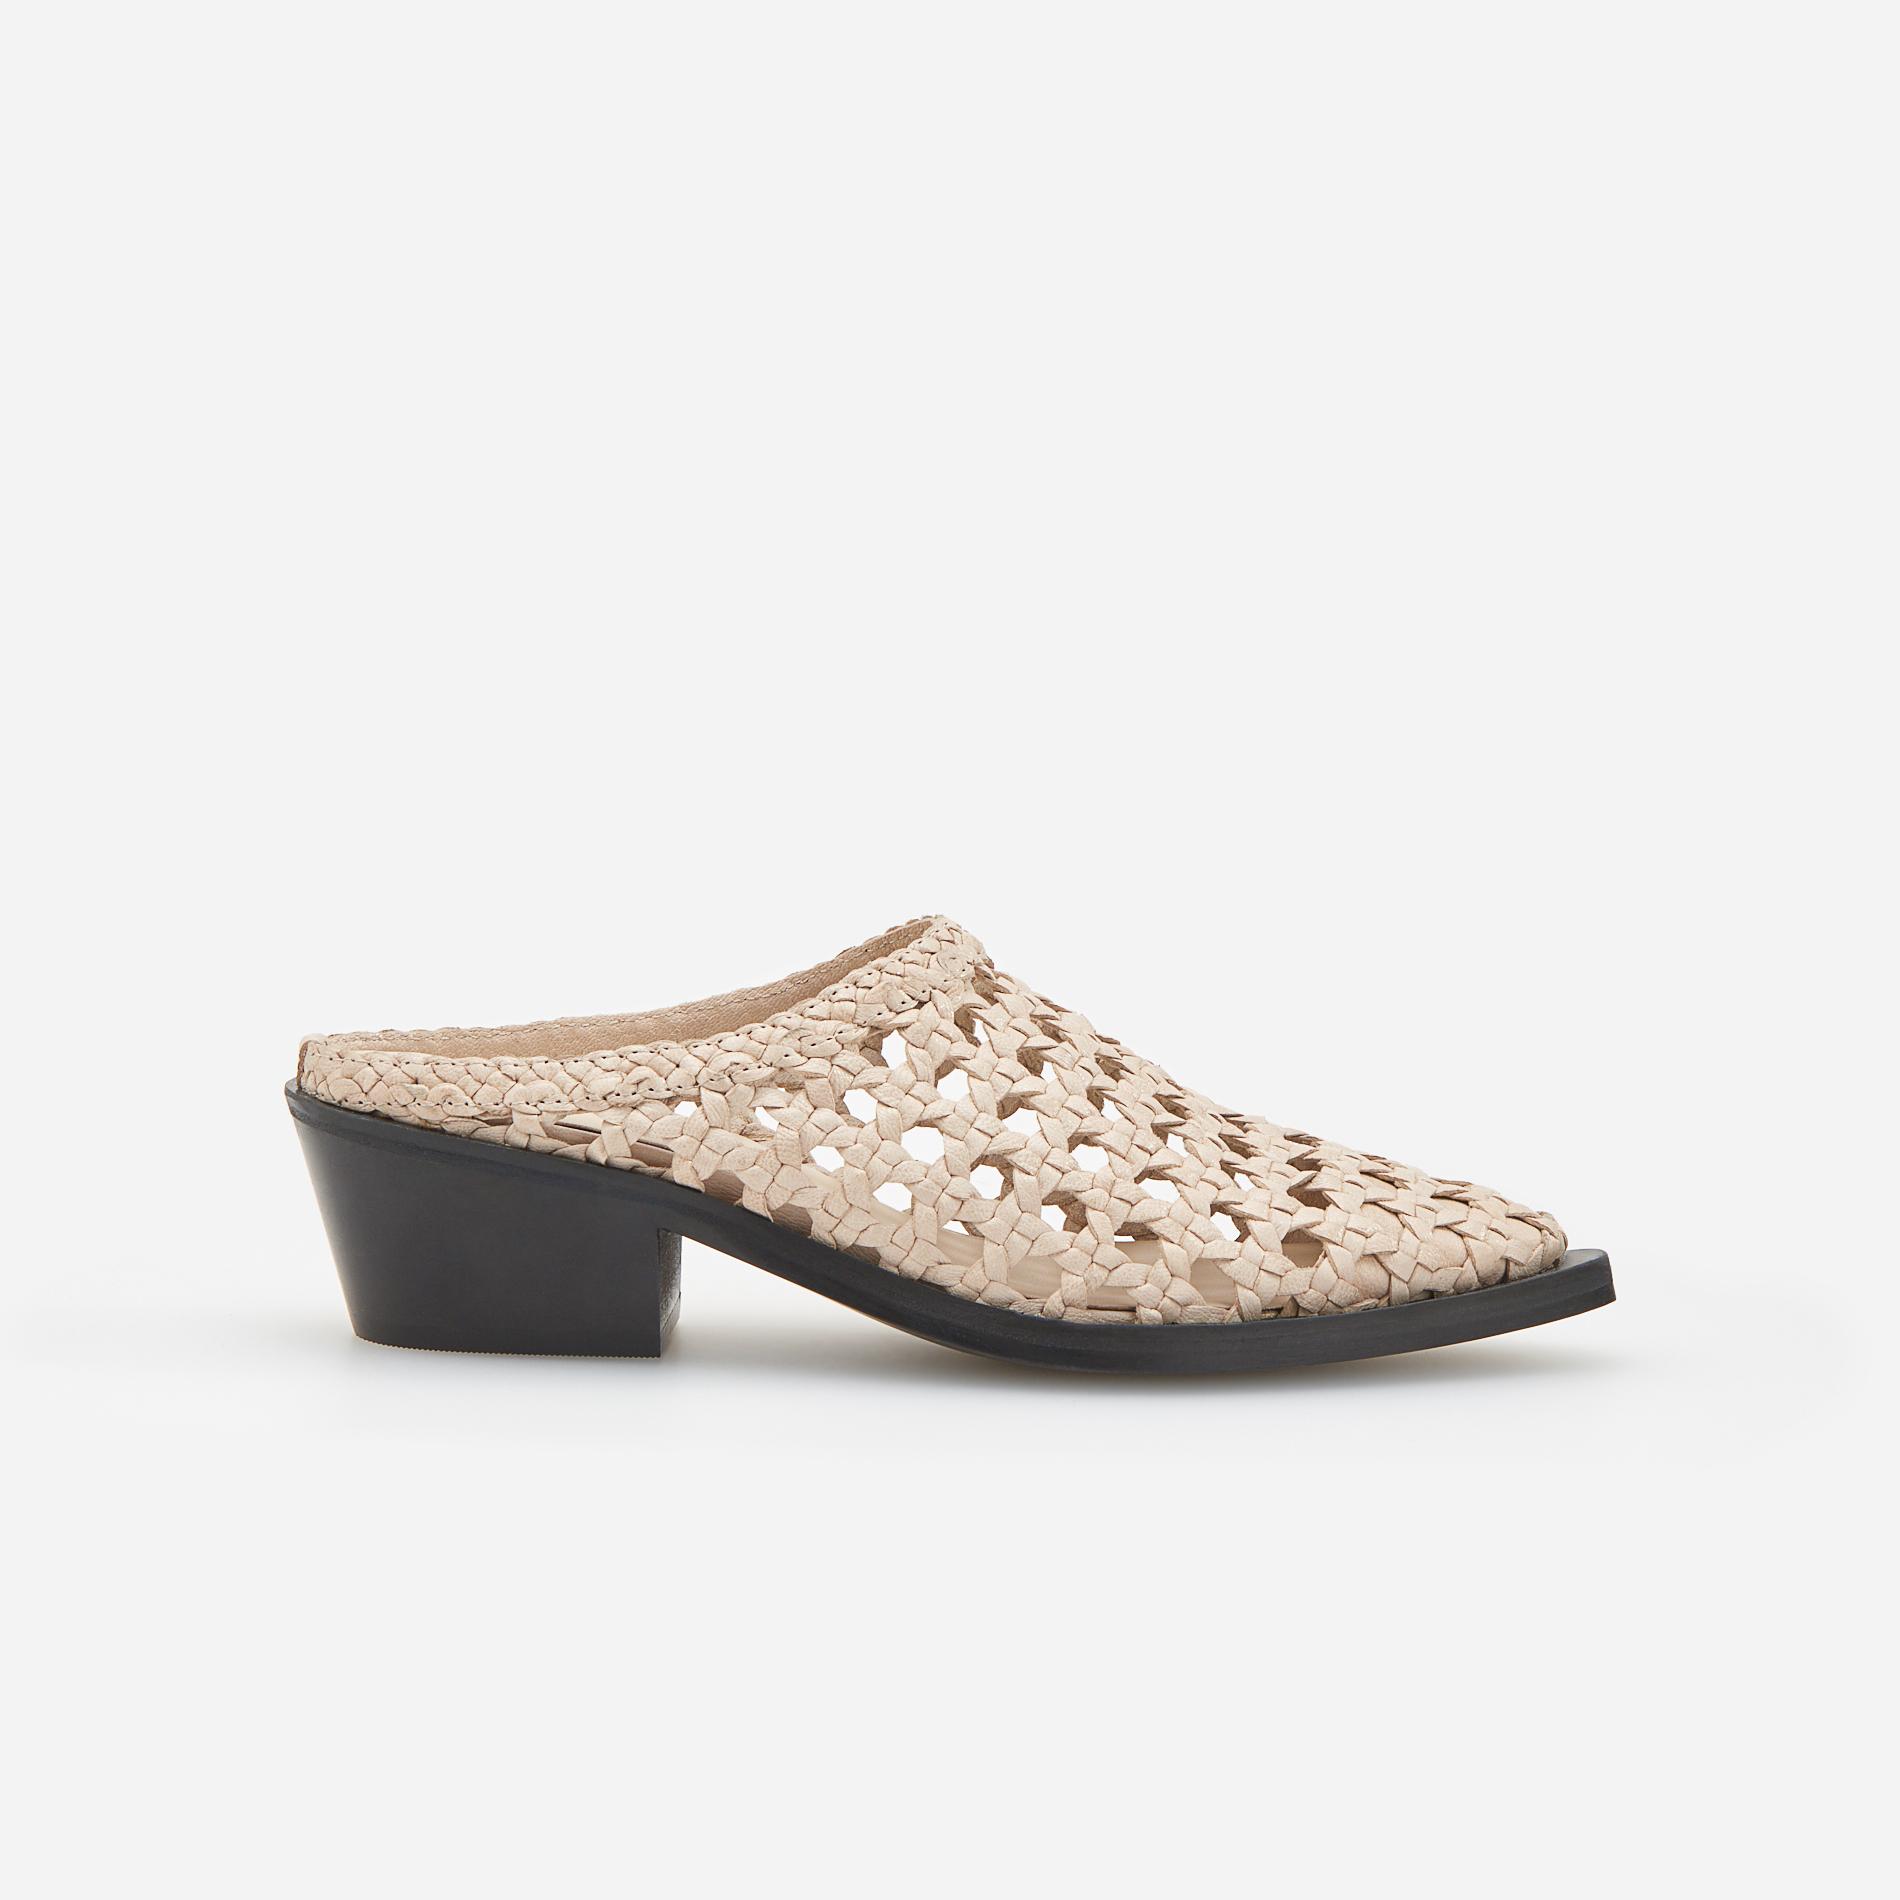 24cc59450c37 Reserved Kožne sandale s otvorenom petom - slonovača - Glami.hr